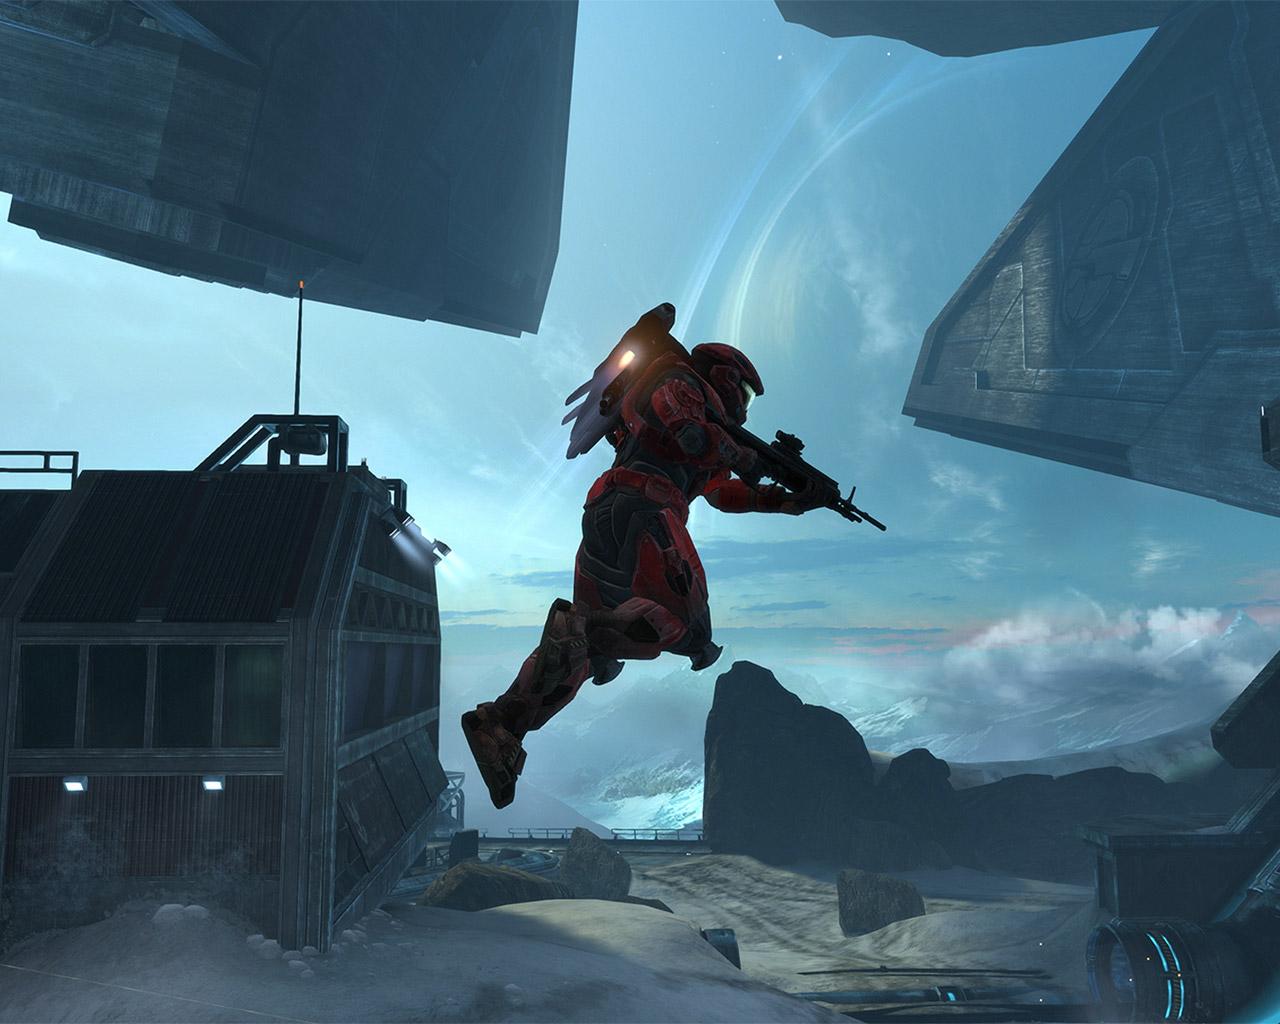 Free Halo: Reach Wallpaper in 1280x1024